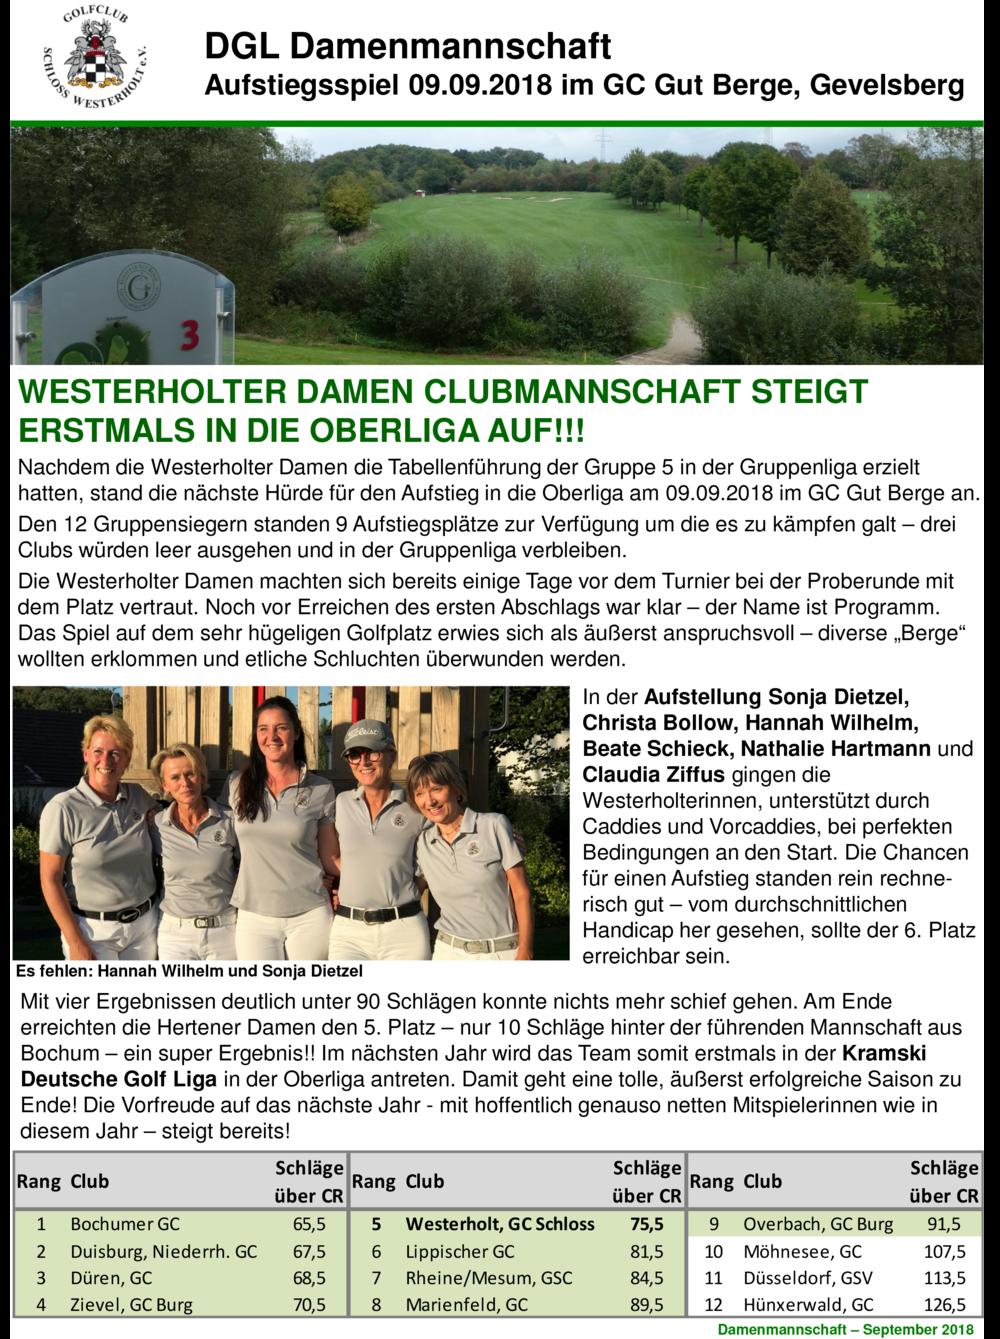 2018 DGL 09-09 Aufstiegsspiel Gut Berge.png